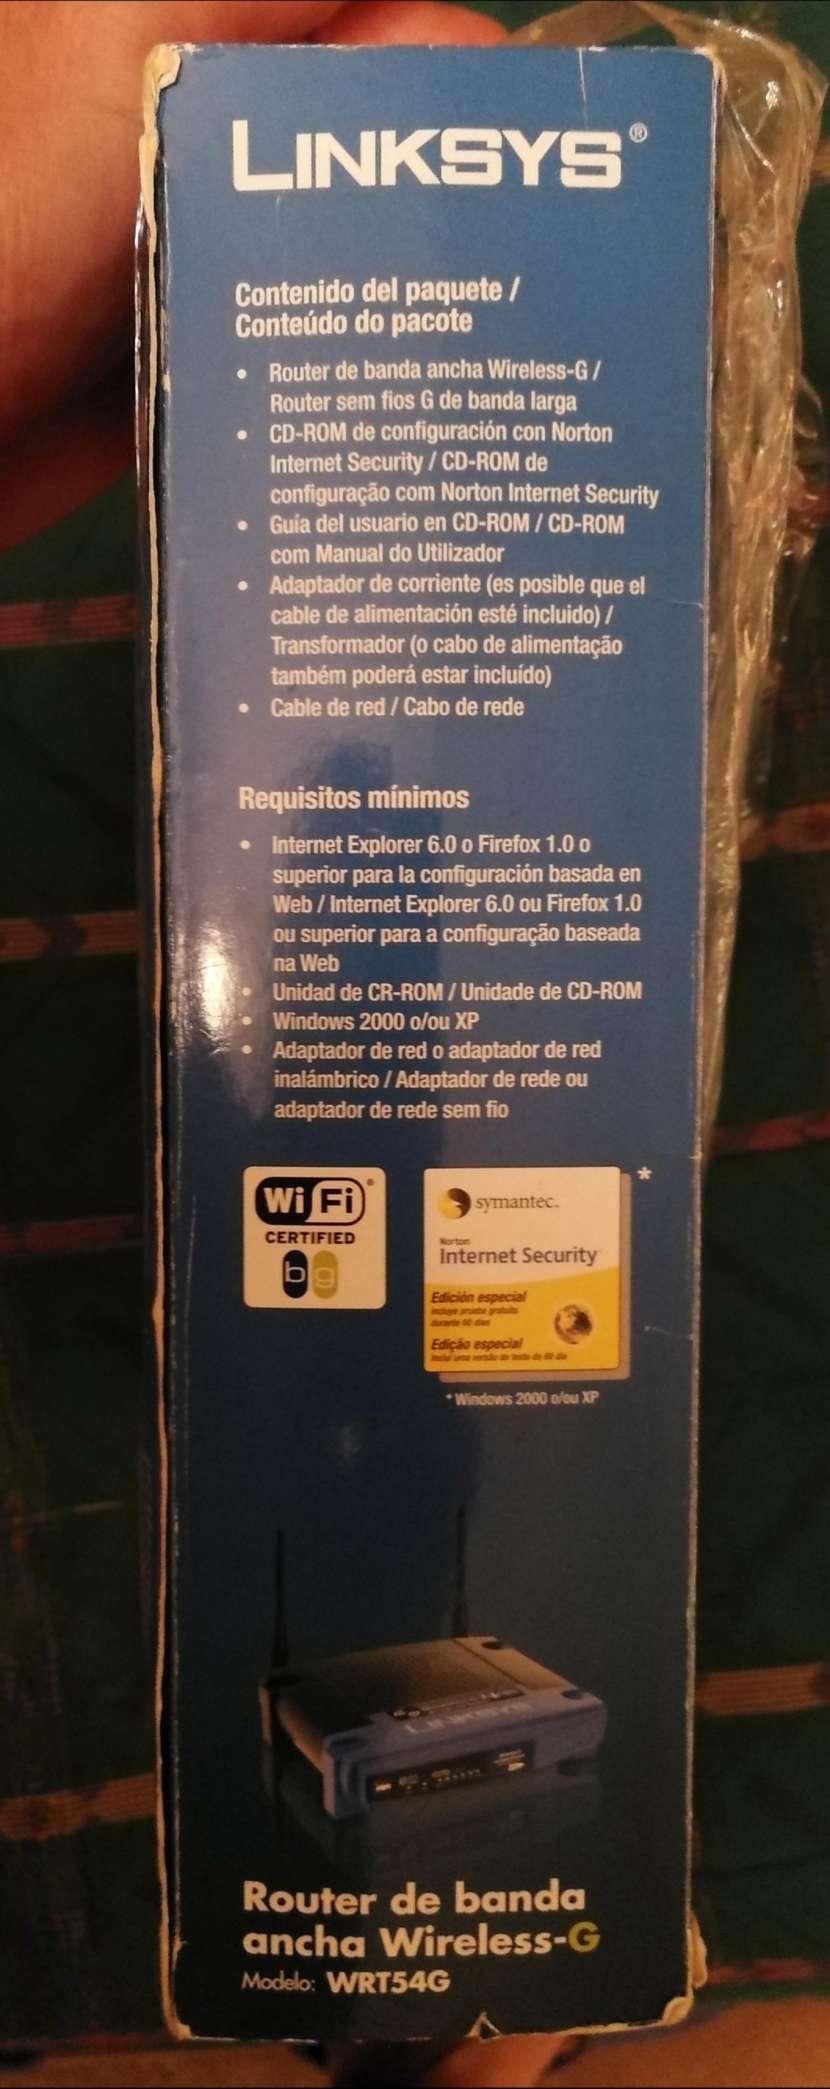 Equipo de Wi Fi Wirreless Linmsys - 4